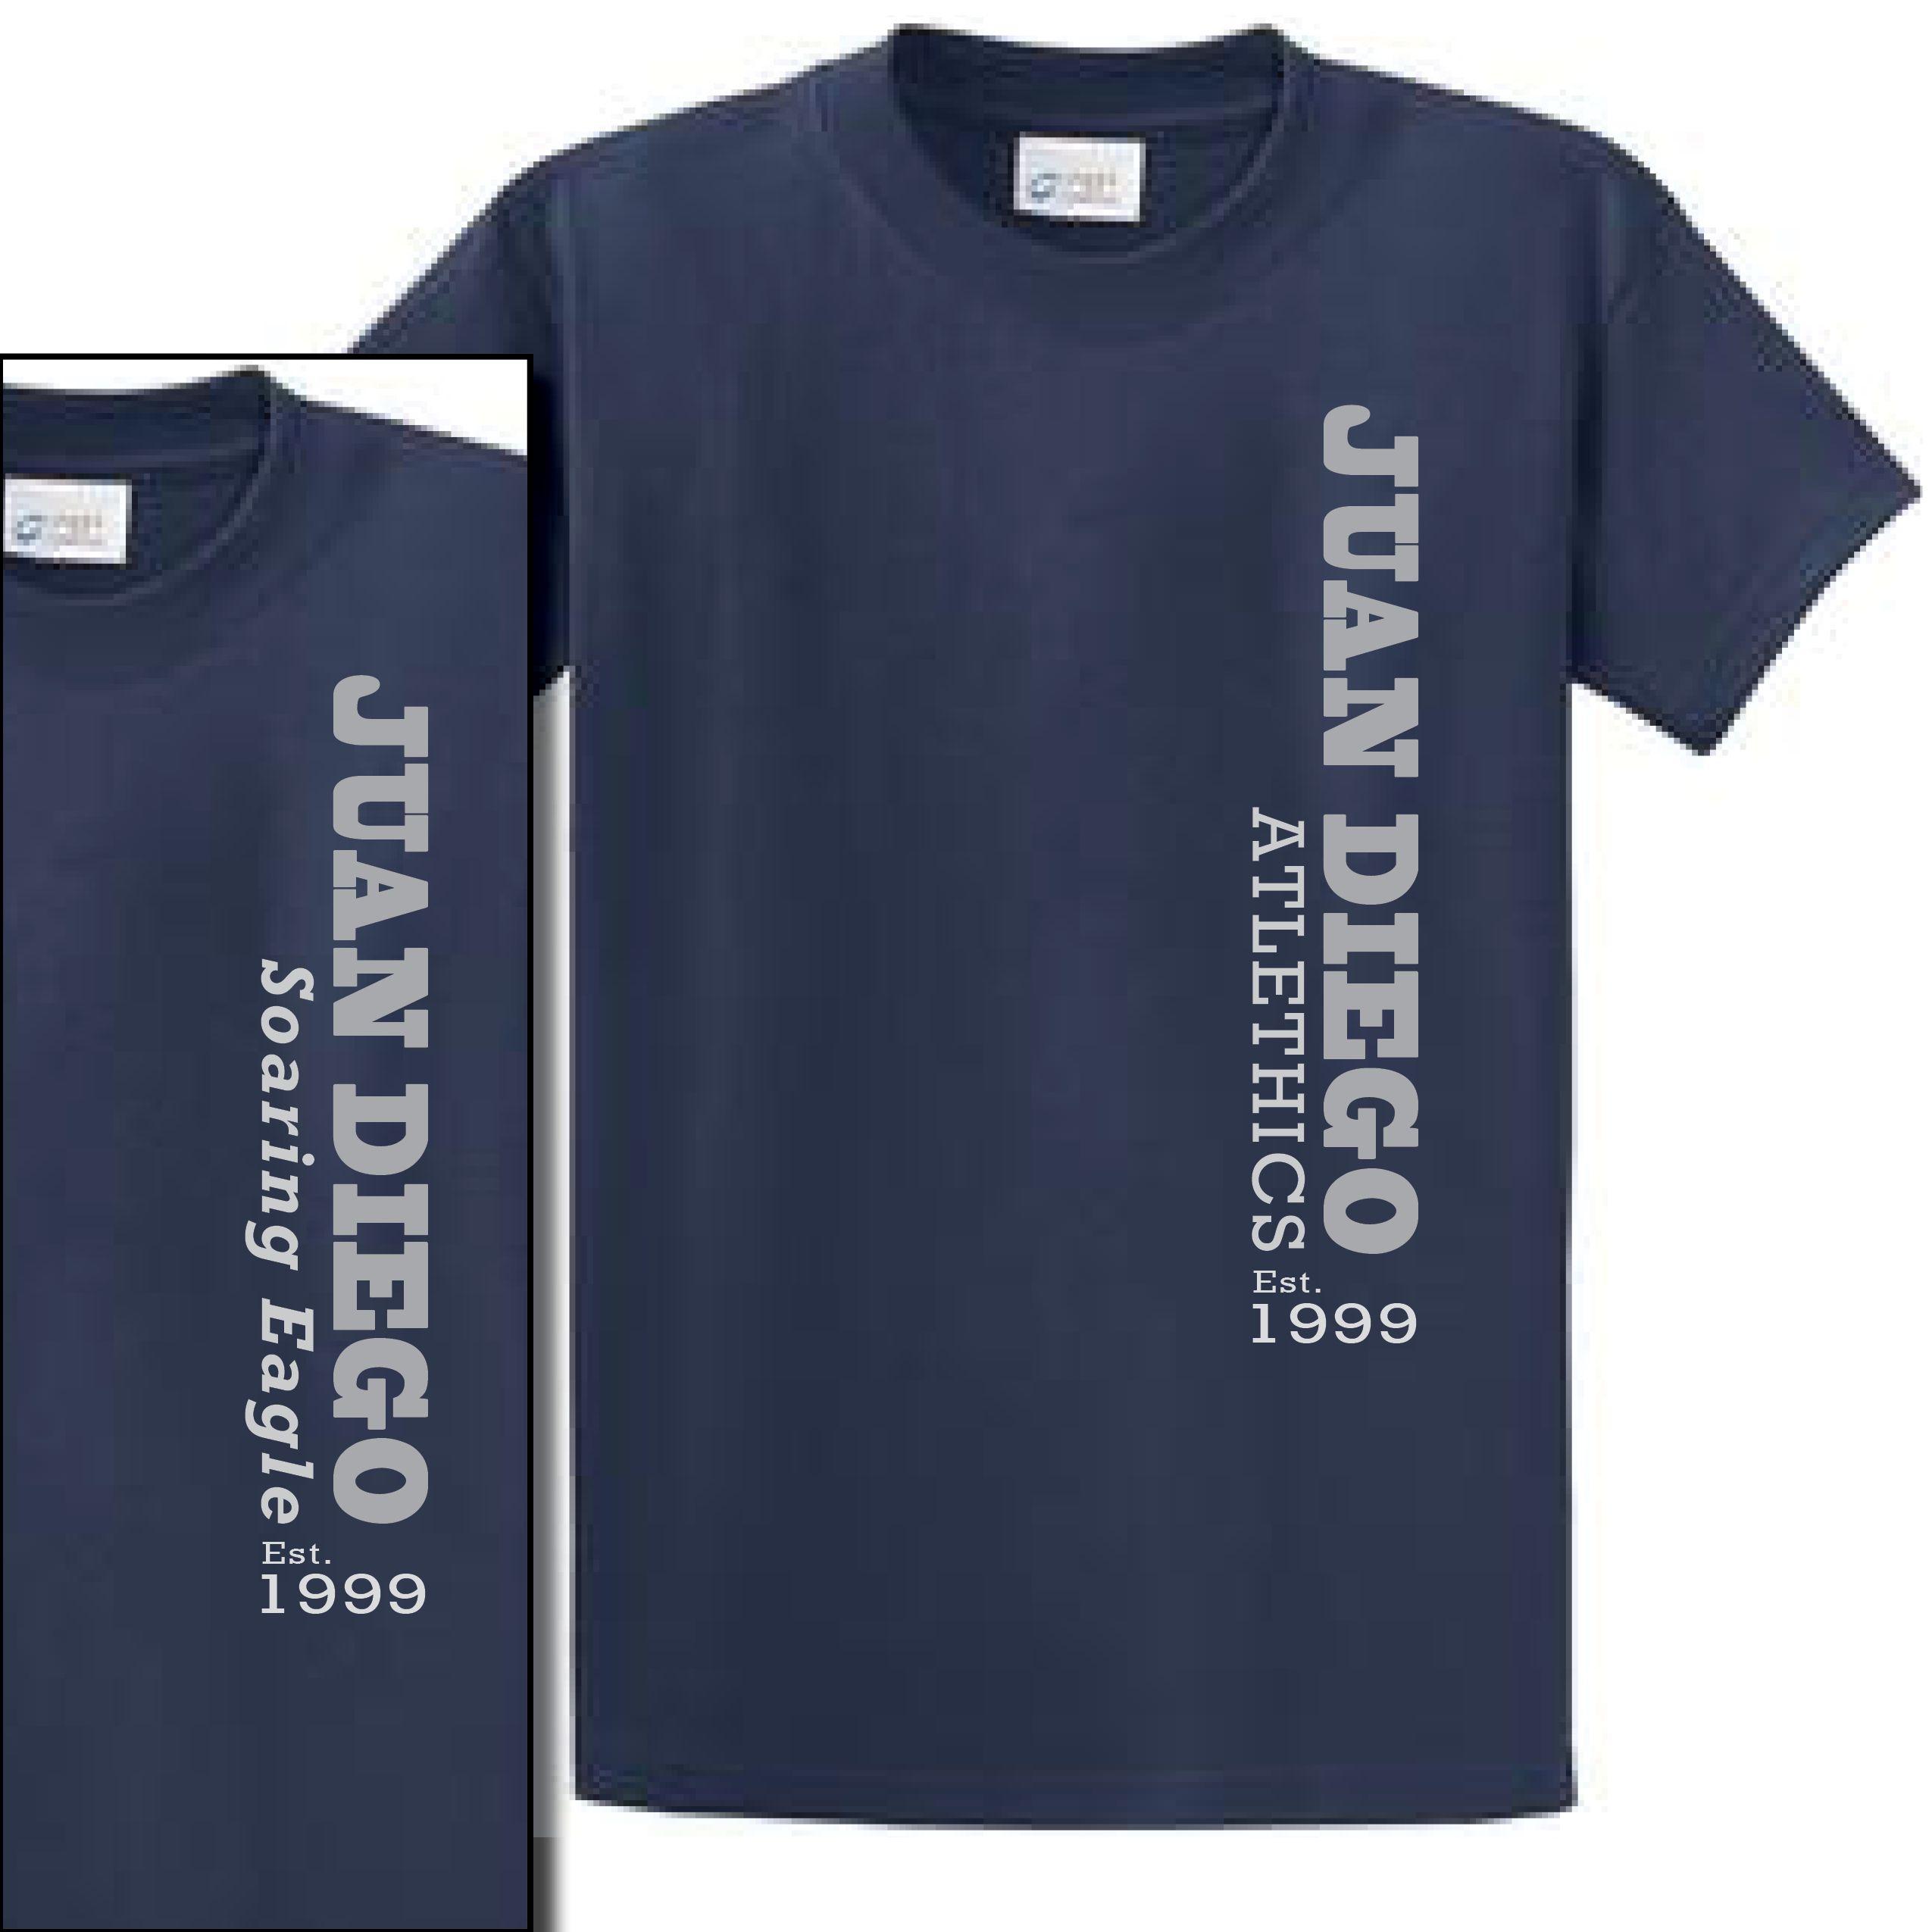 ... School Athletic T Shirt Design Ideas. Download